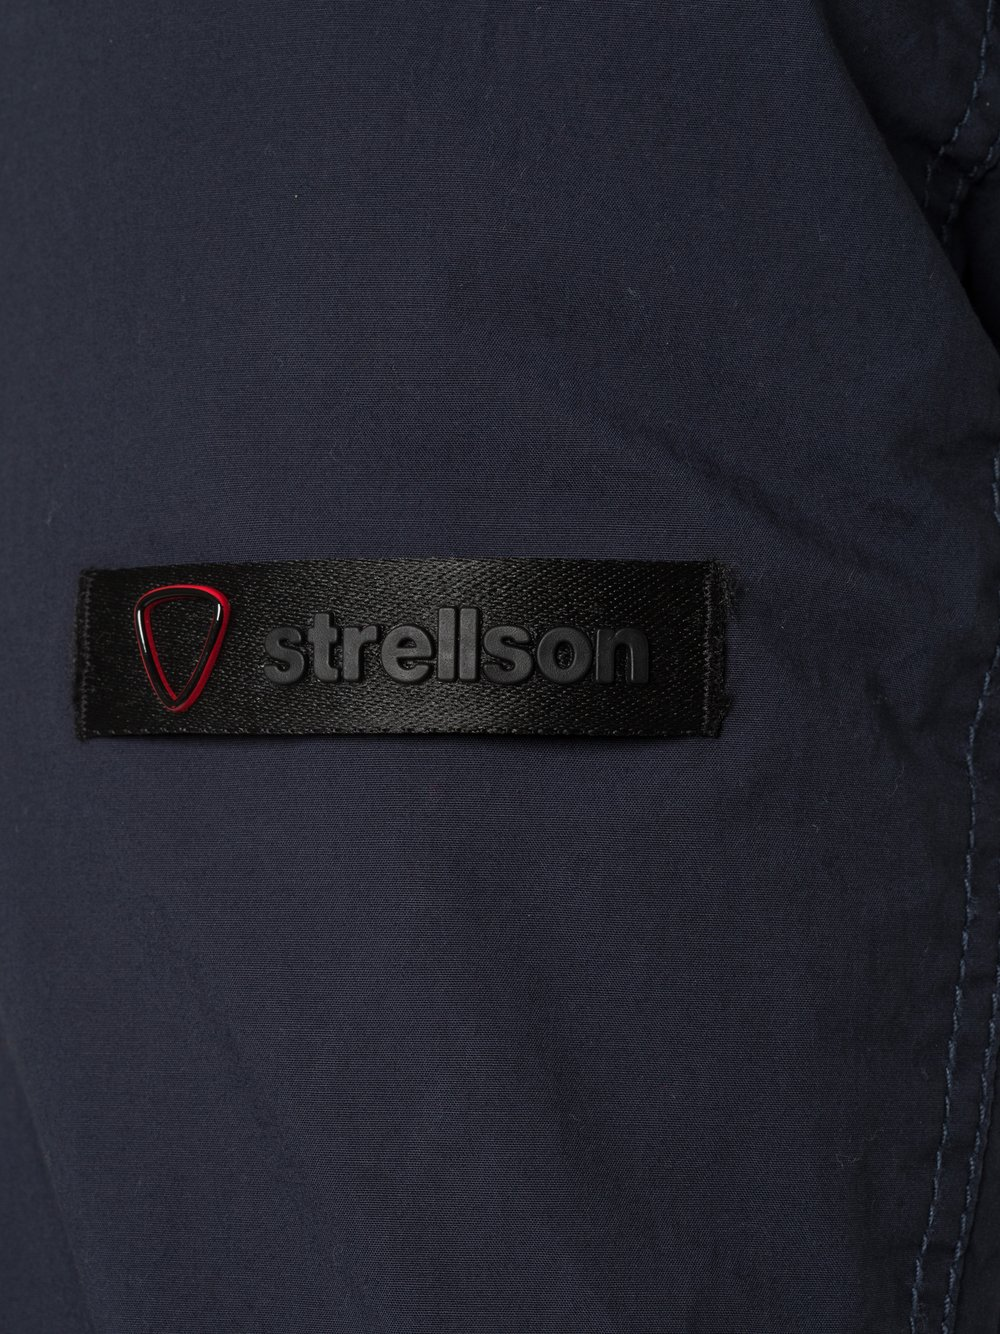 huge selection of dbe6e 2233c Strellson Herren Jacke - Strong-W online kaufen | PEEK-UND ...